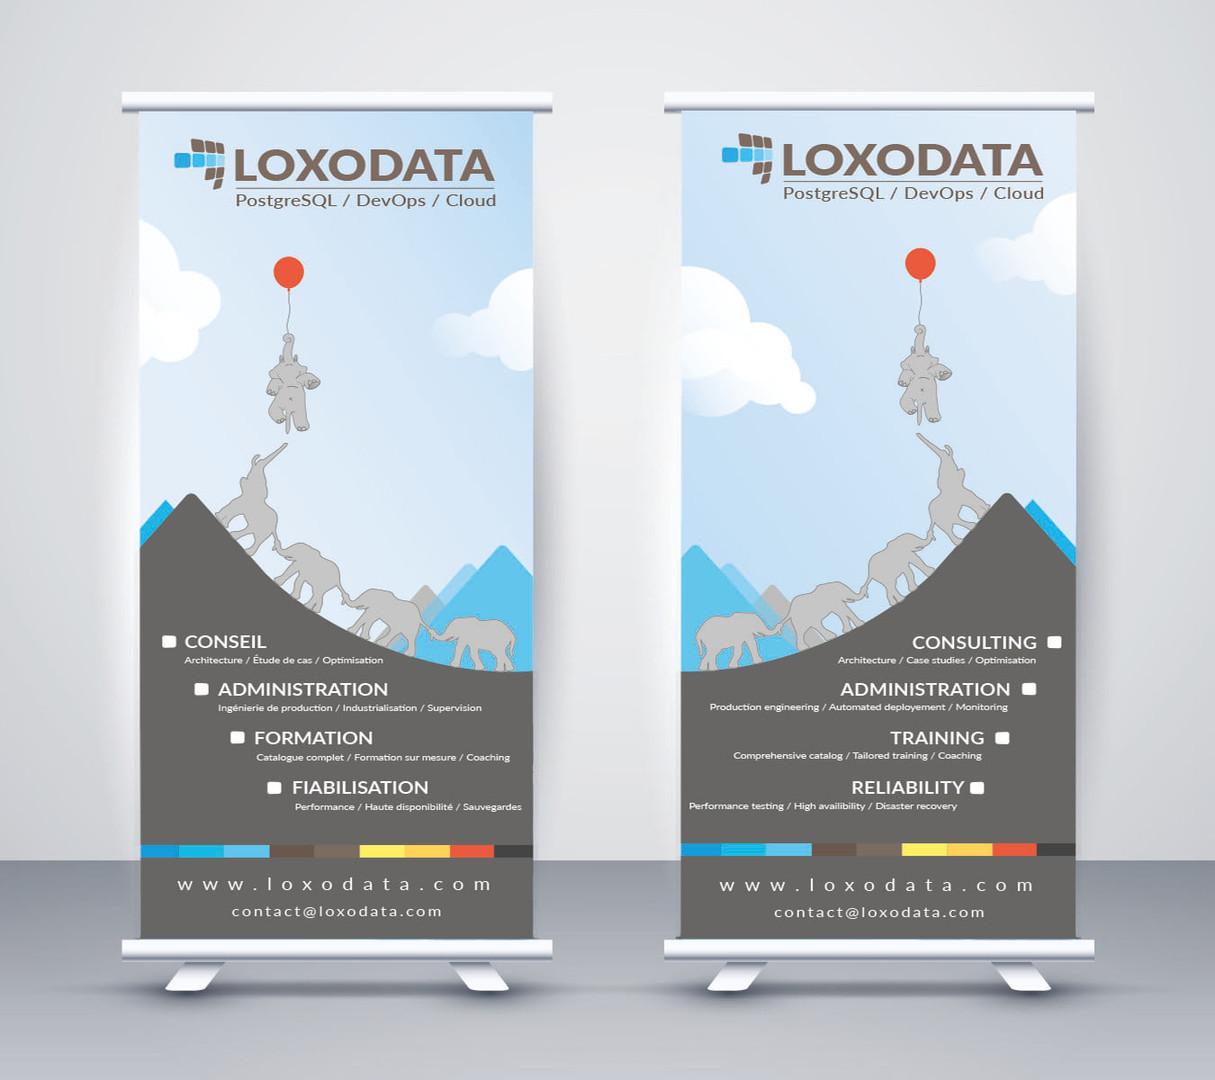 LOXODATA